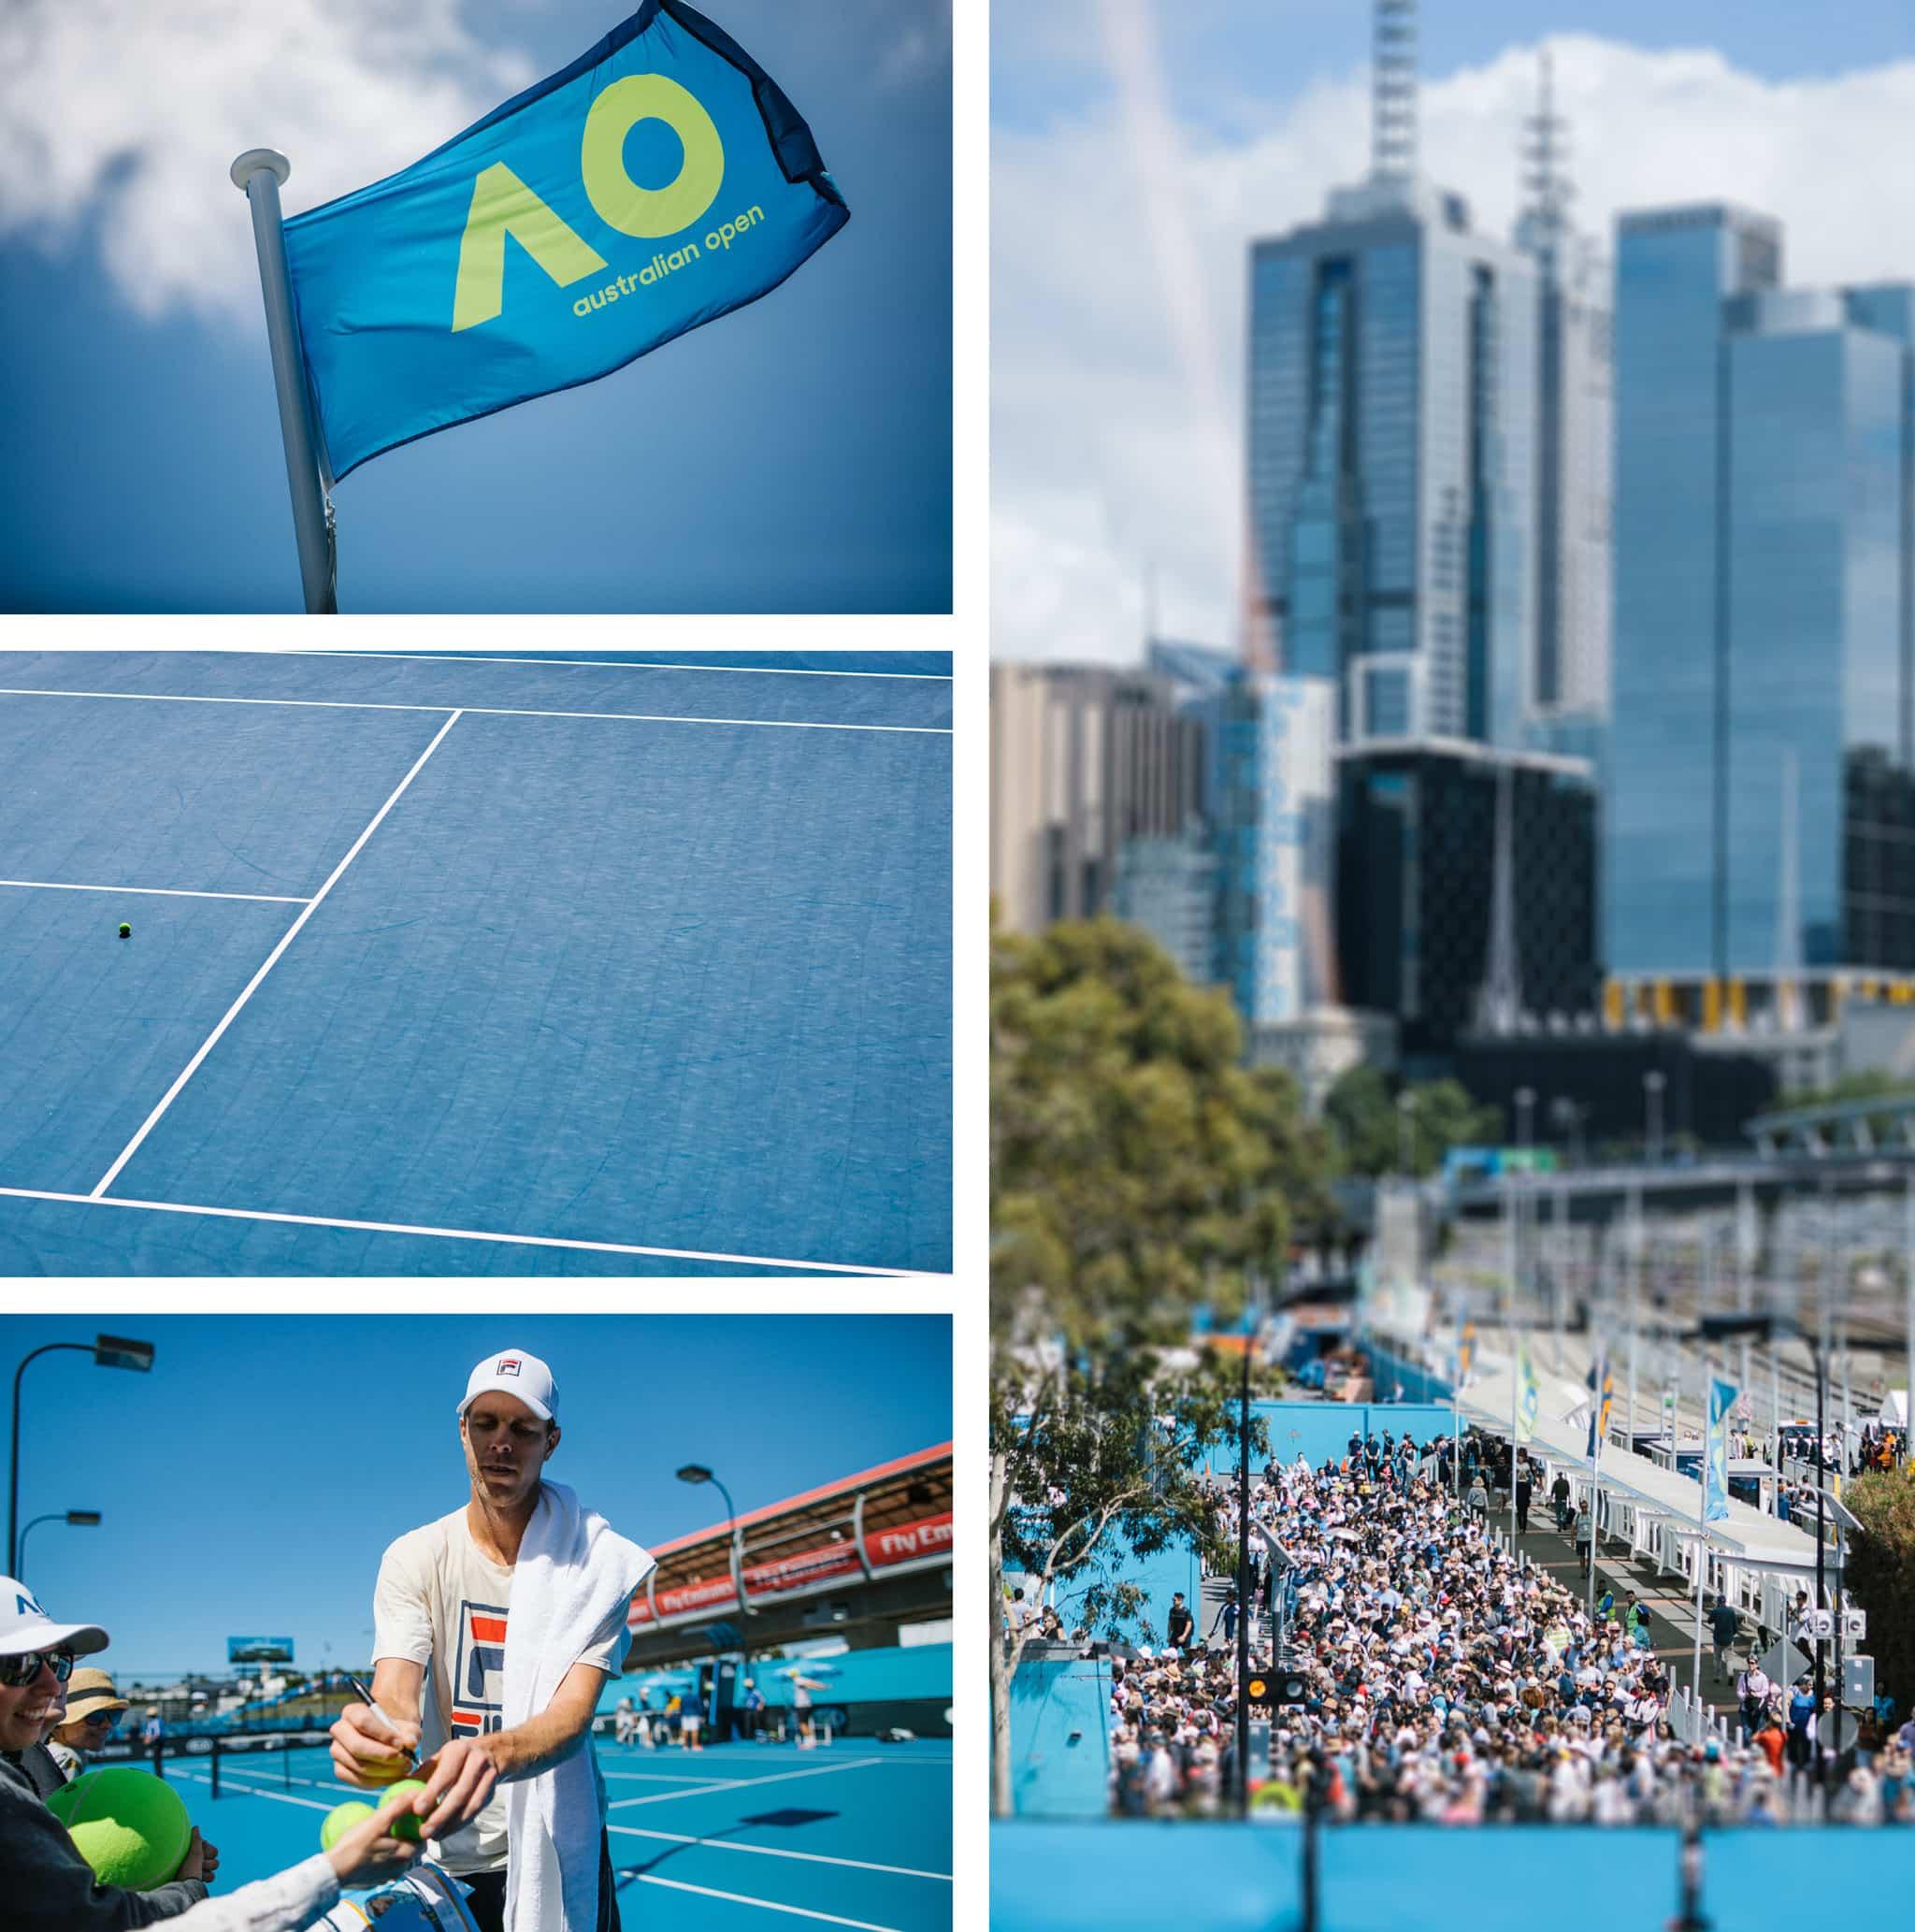 premium sports event photographer - different photos